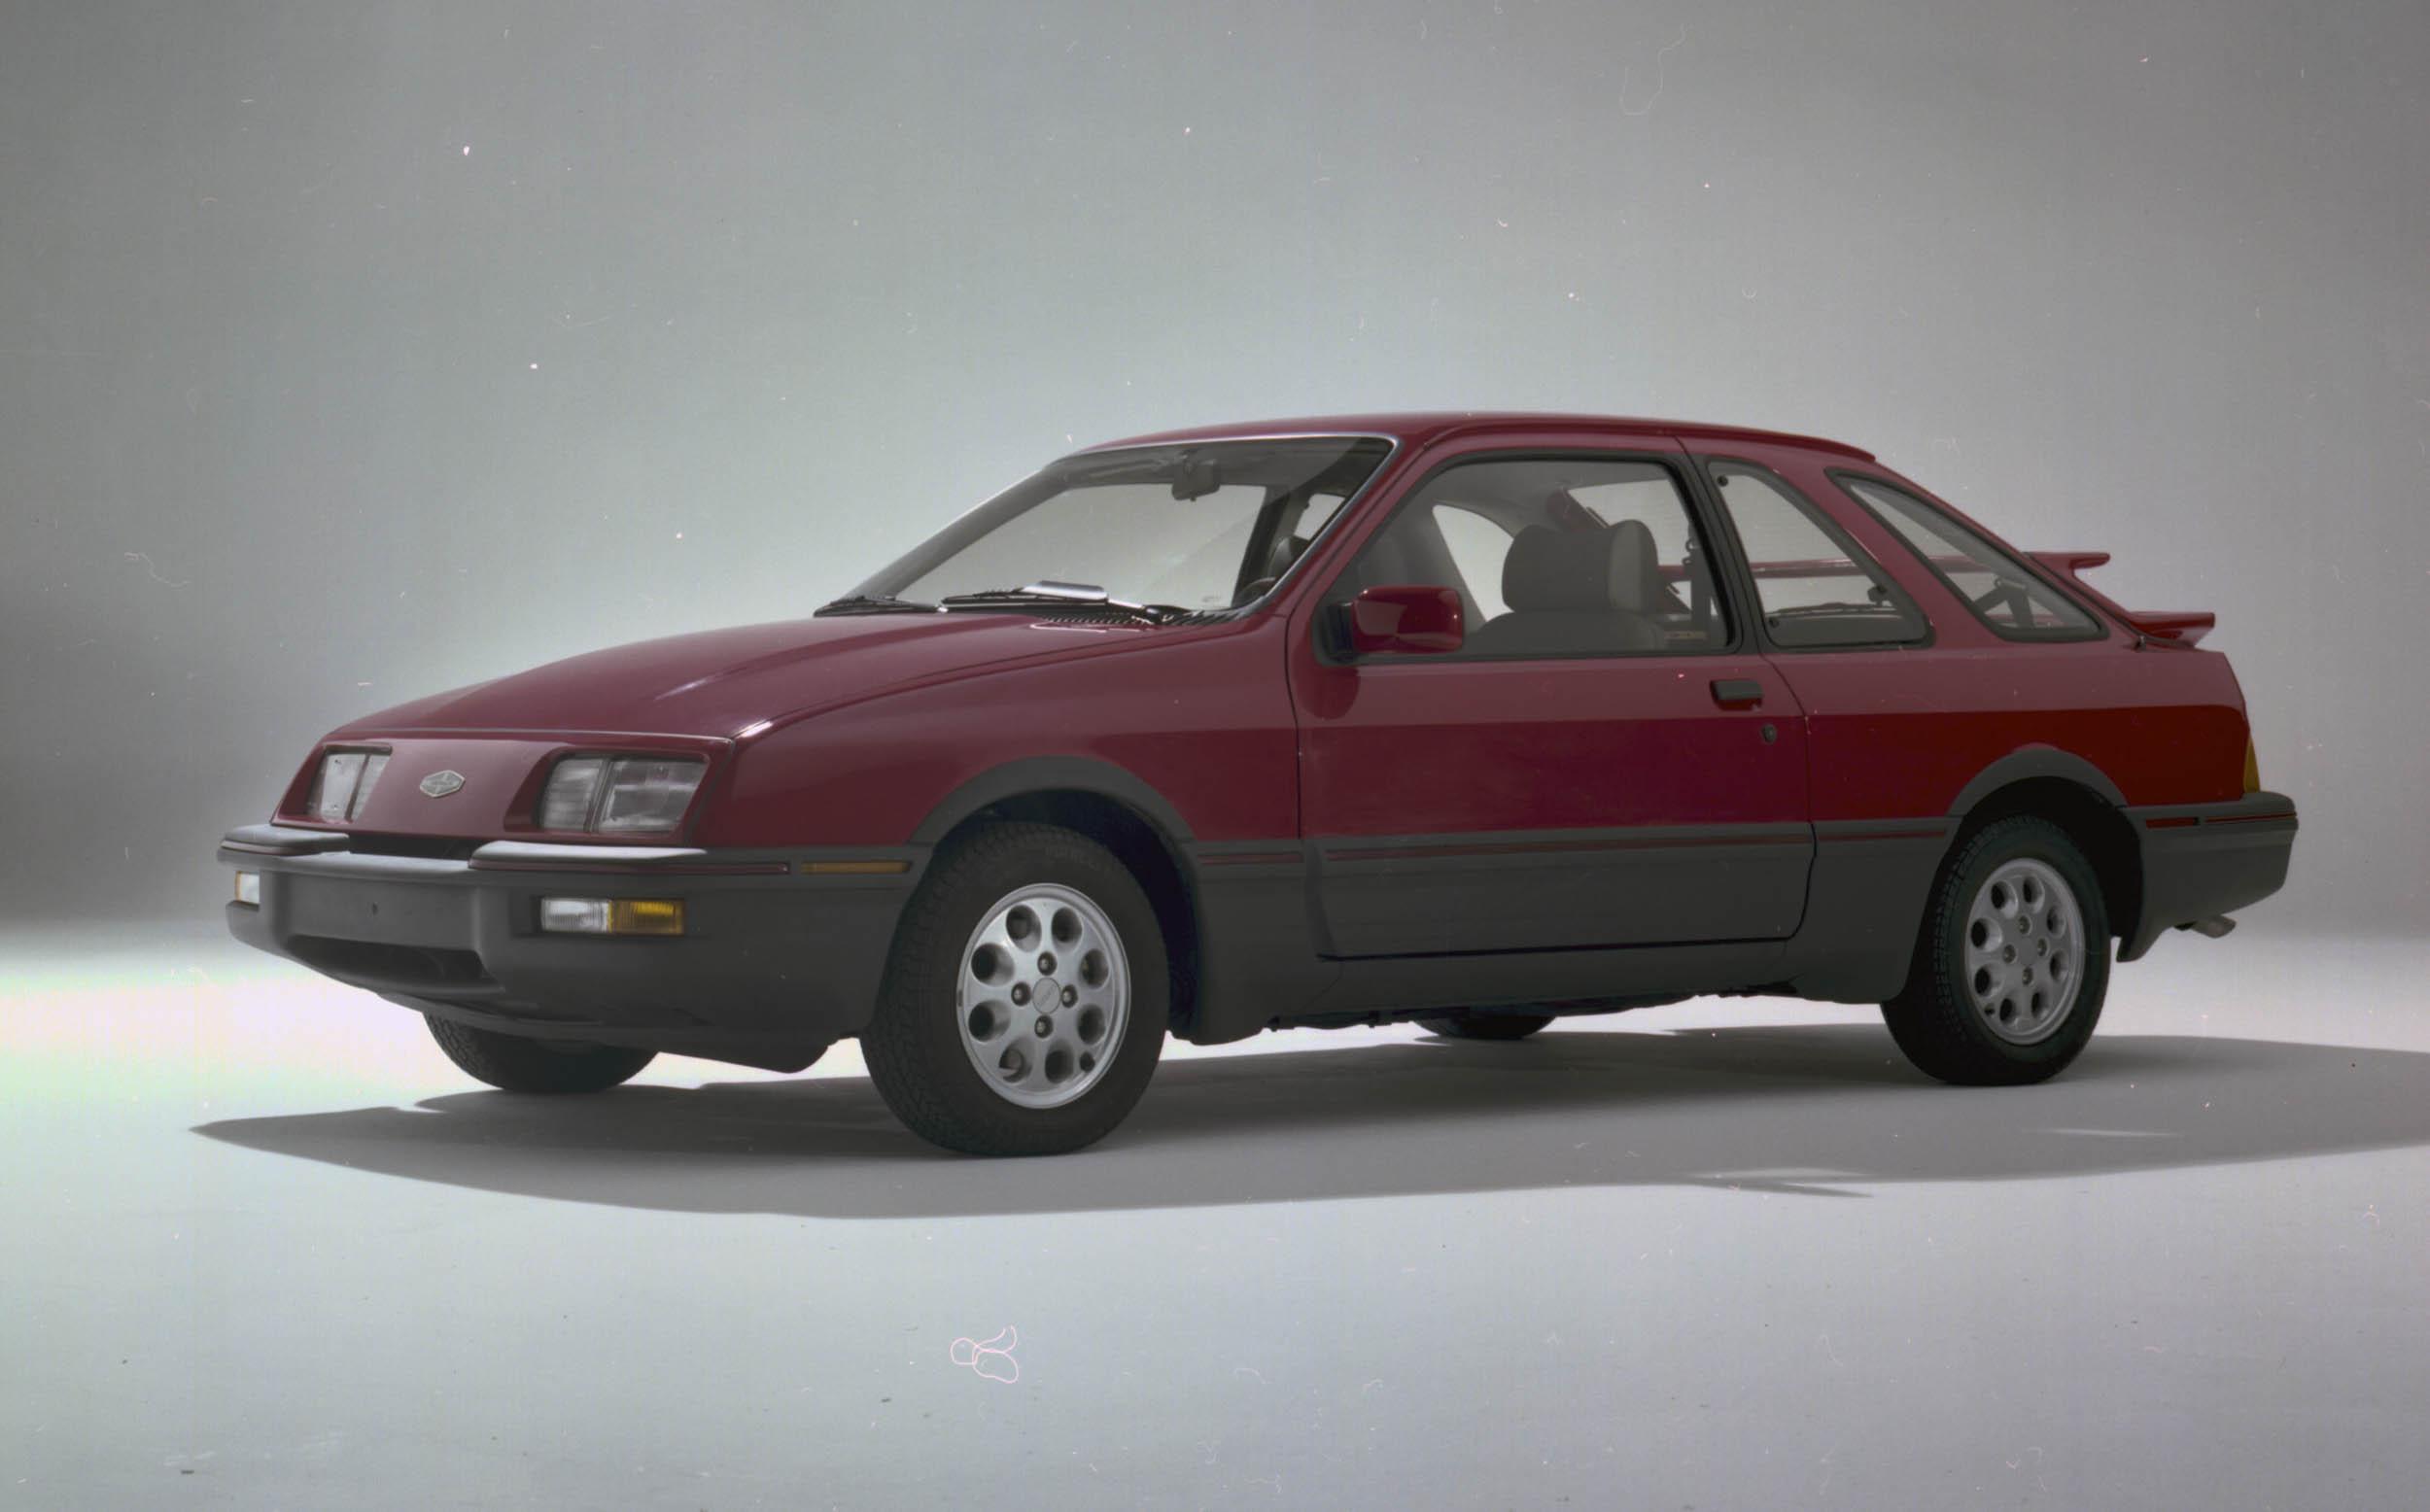 Red 1985 Merkur XR4ti front 3/4